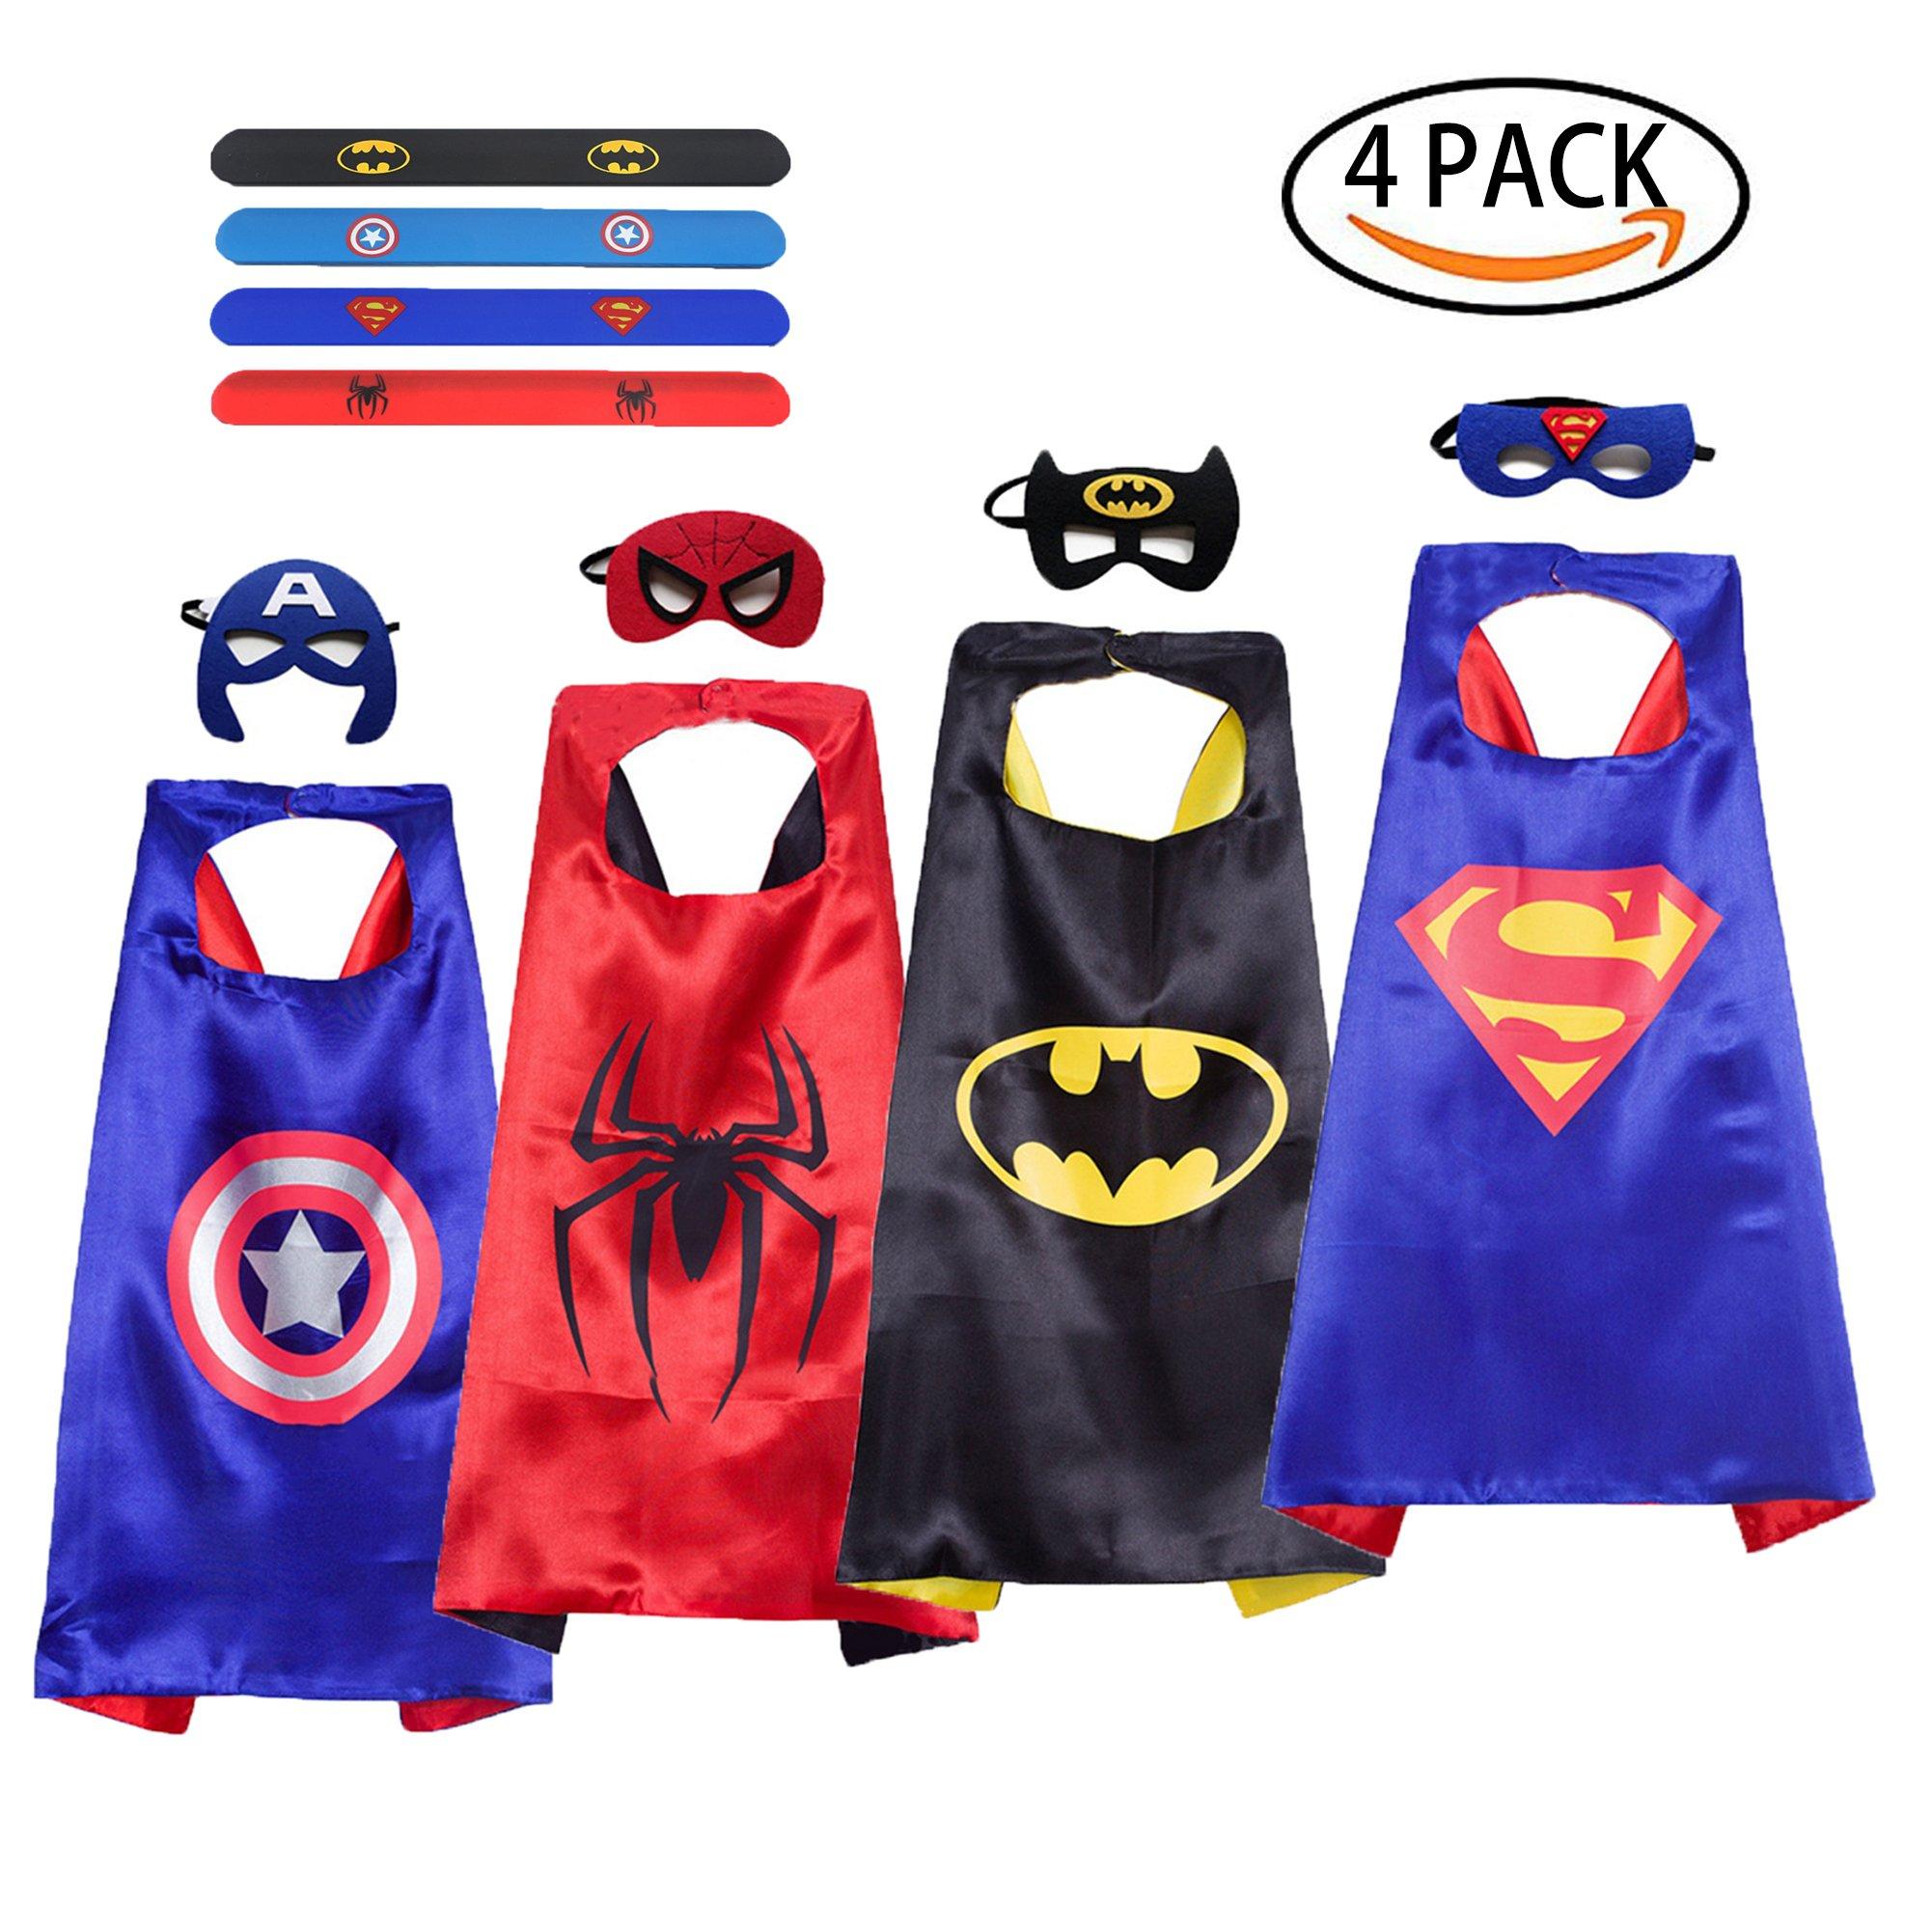 Superhero Dress up Costume, 4 Set Comics Superhero Satin Capes Felt Masks Rubber Slap Bracelet DIY Kids Boys & Girls Cosplay Gift Birthday Party Supplies Favors (4-Pack)